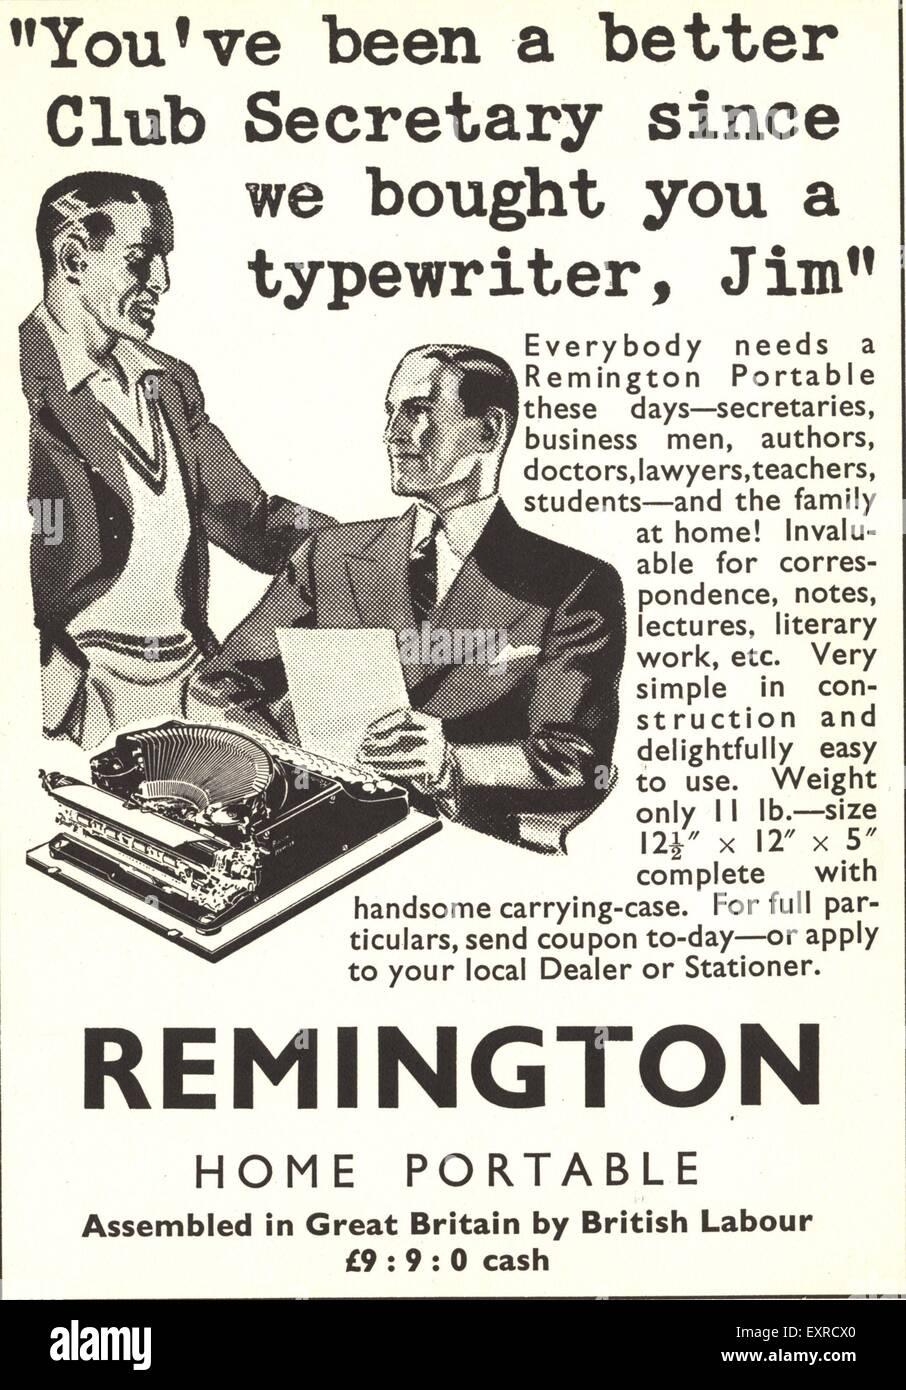 1930s UK Remington Magazine Advert Stock Photo: 85337560 - Alamy